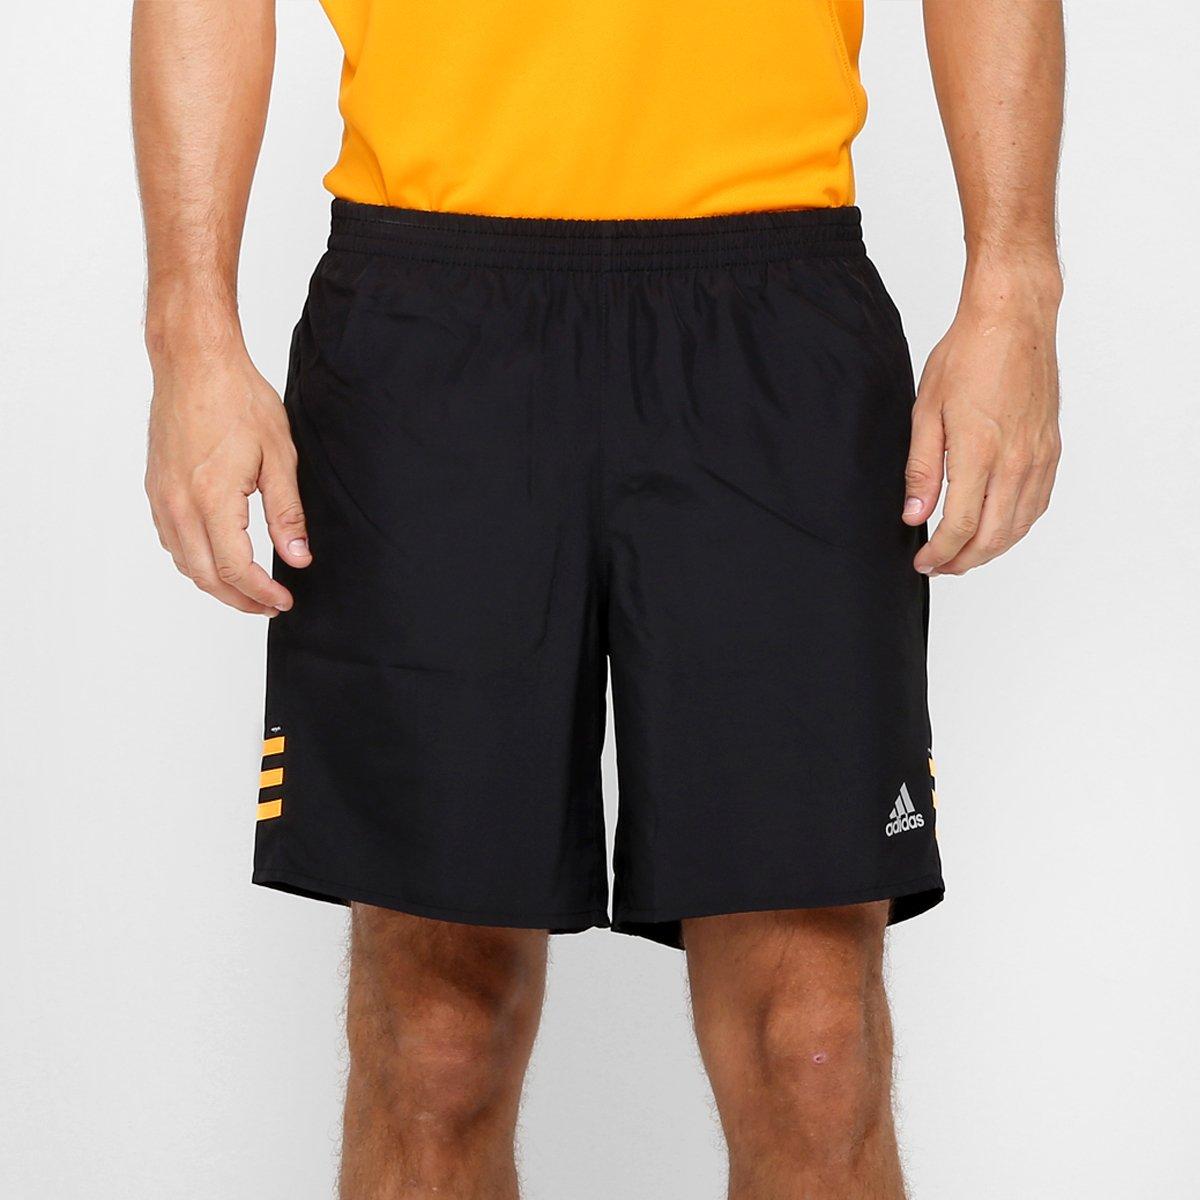 Puma Ignite Masculino Shorts de Corrida Split-Preto